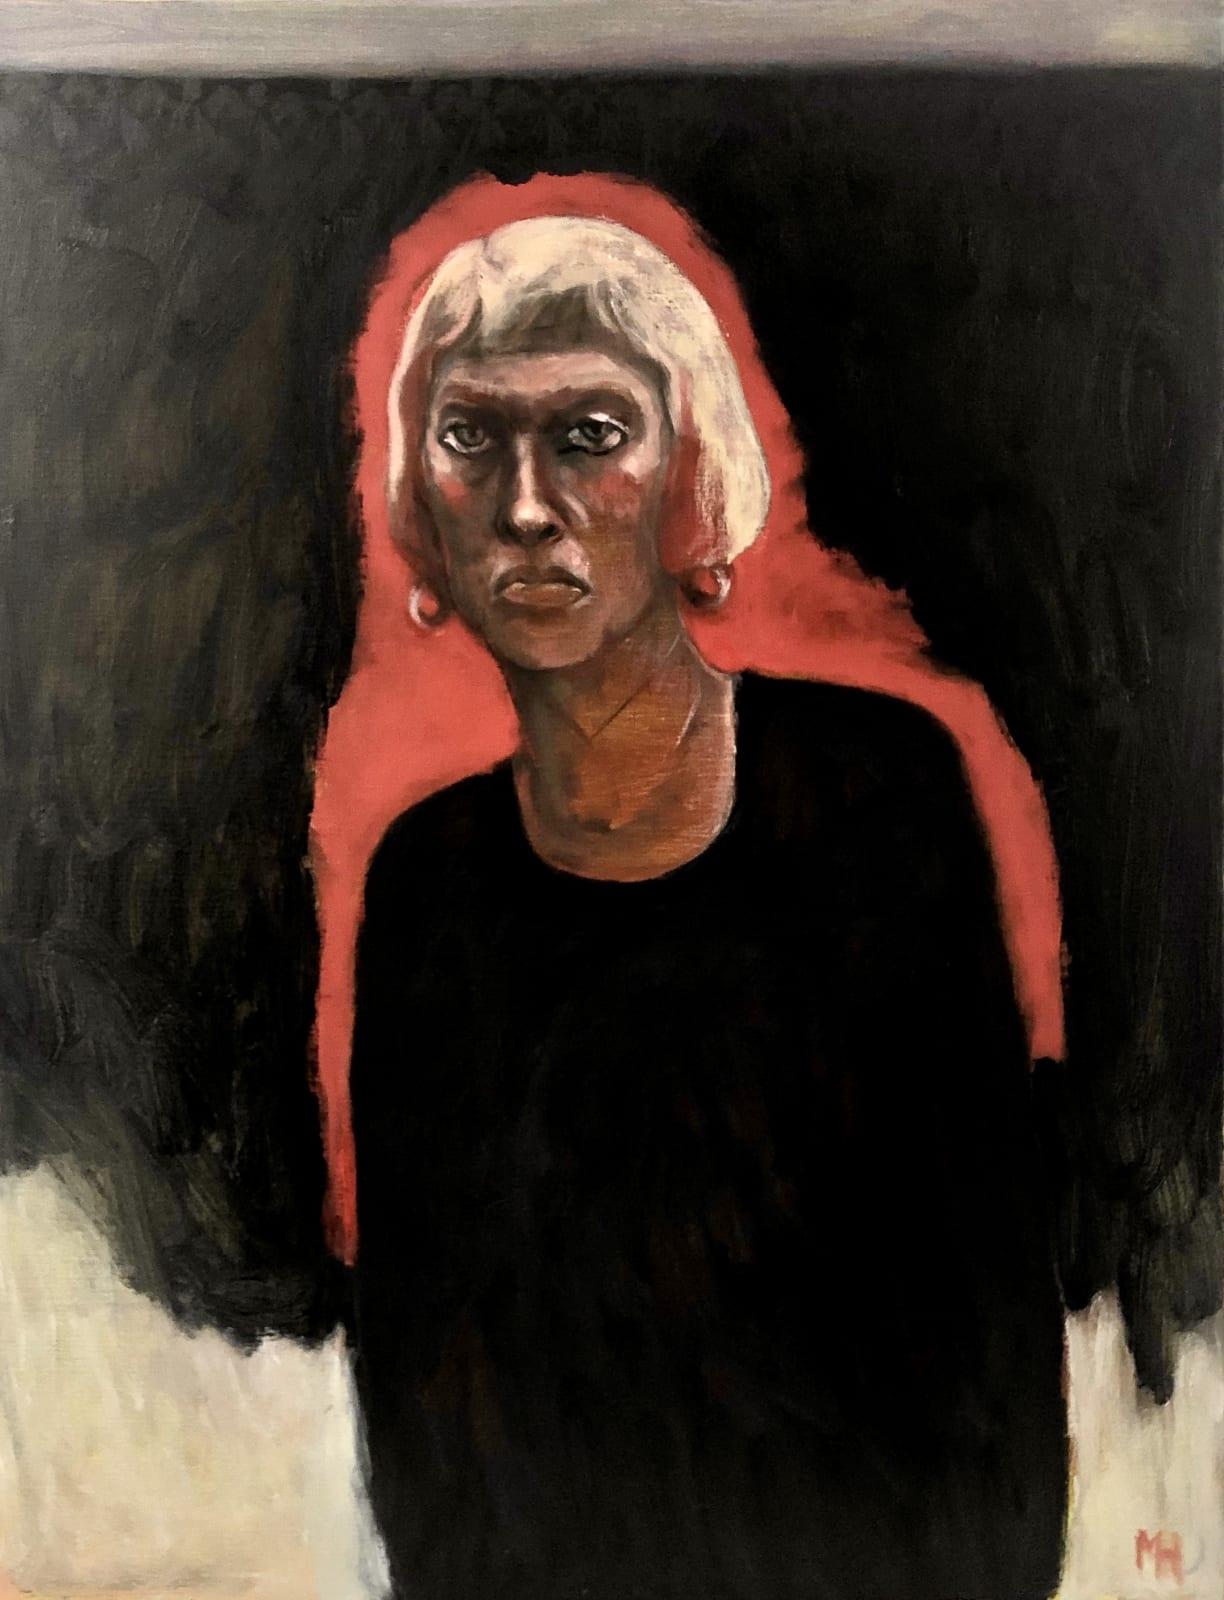 Marcelle Hanselaar, Self Portrait in Isolation